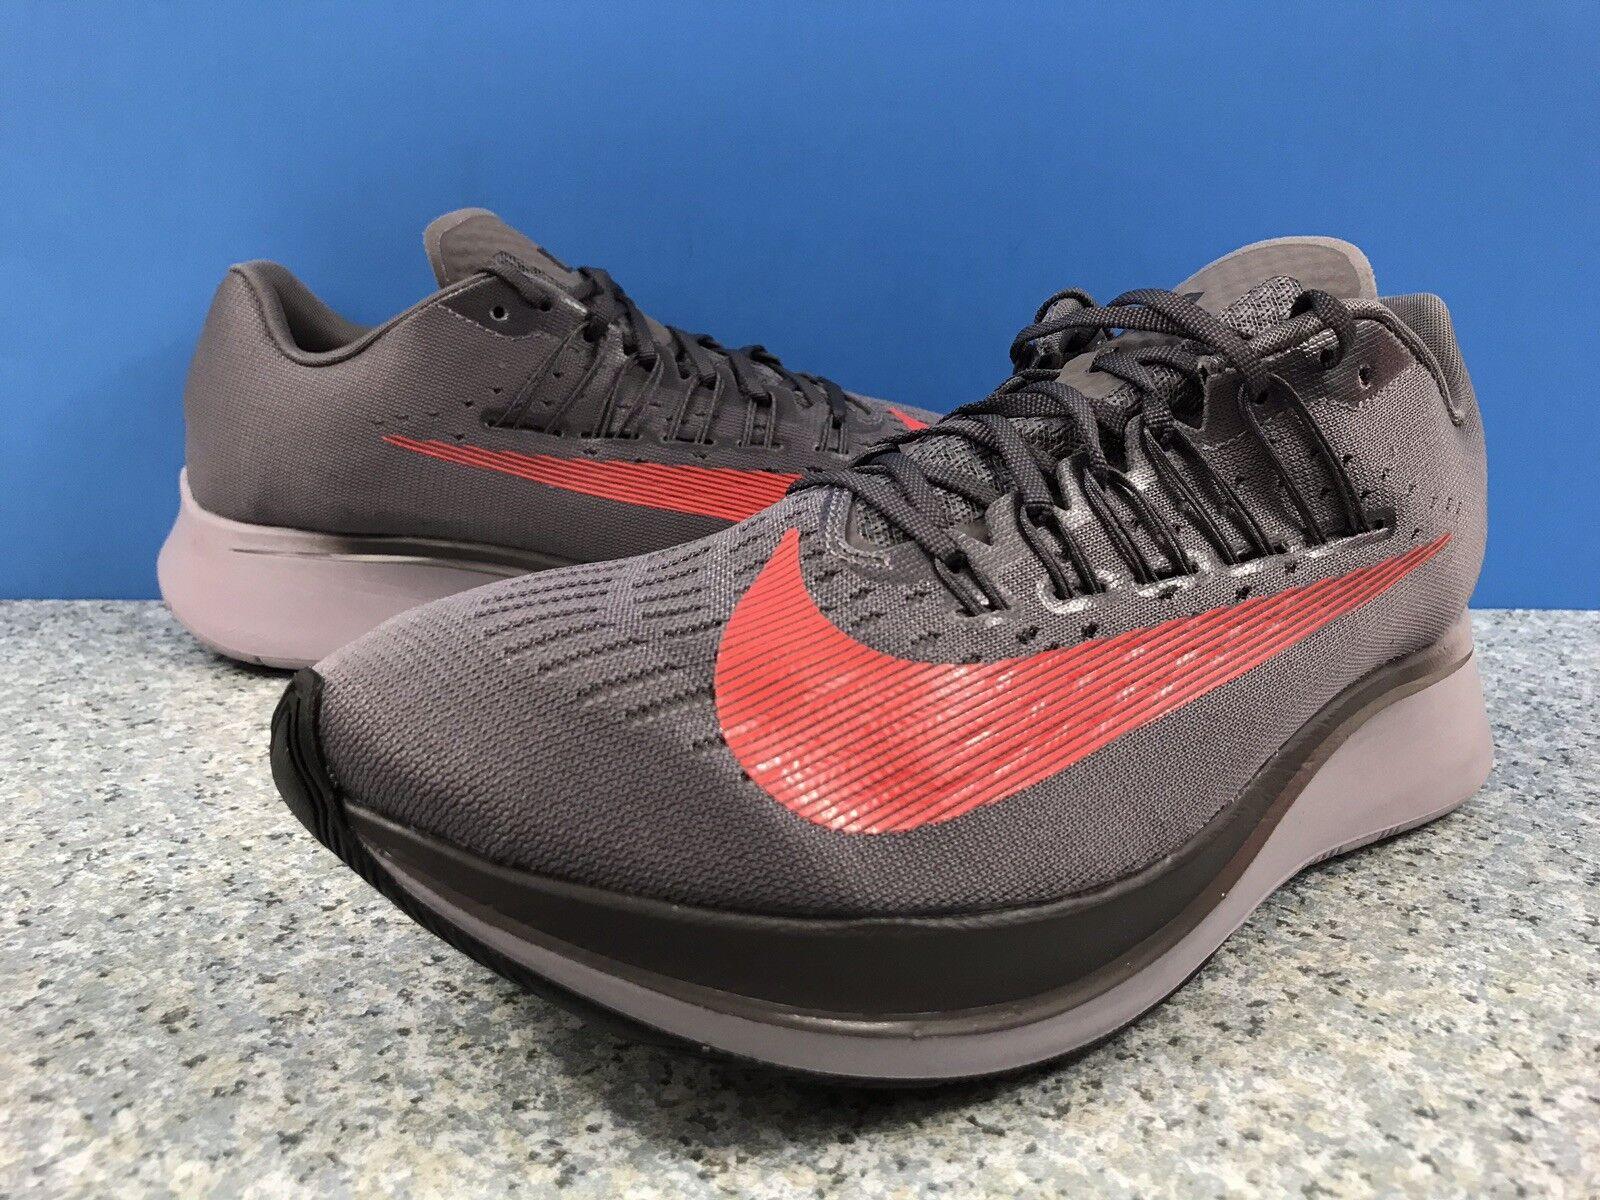 Nike Zoom Fly 880848-004 Men Running shoes Sz 13 Gunsmoke Bright Crimson